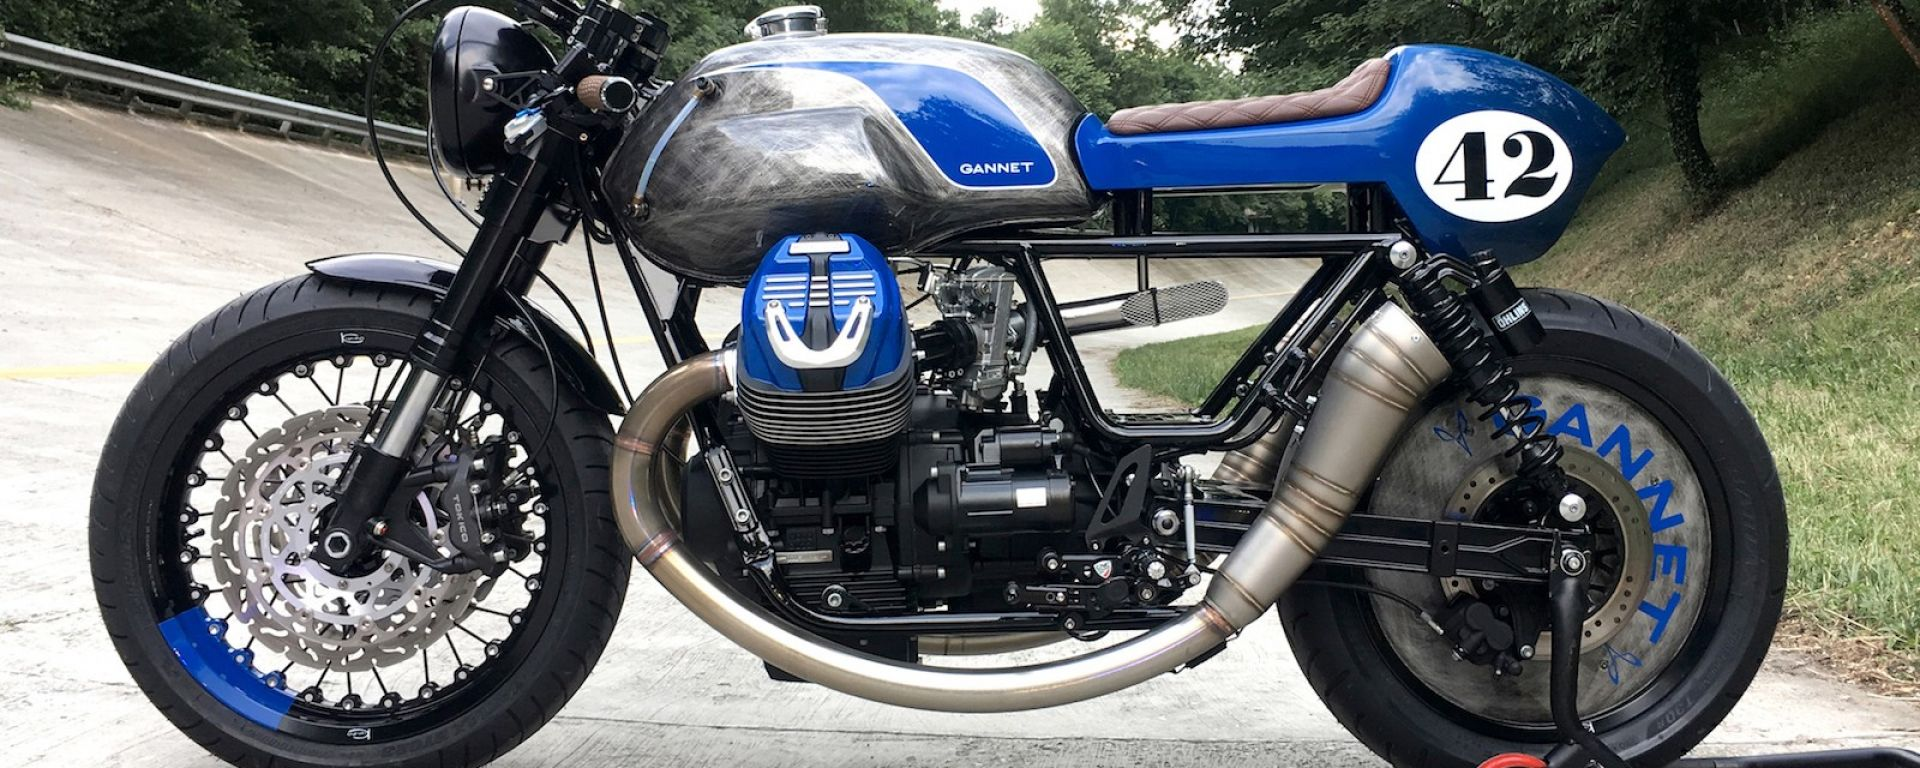 Moto Guzzi V9: una Special Imperiale